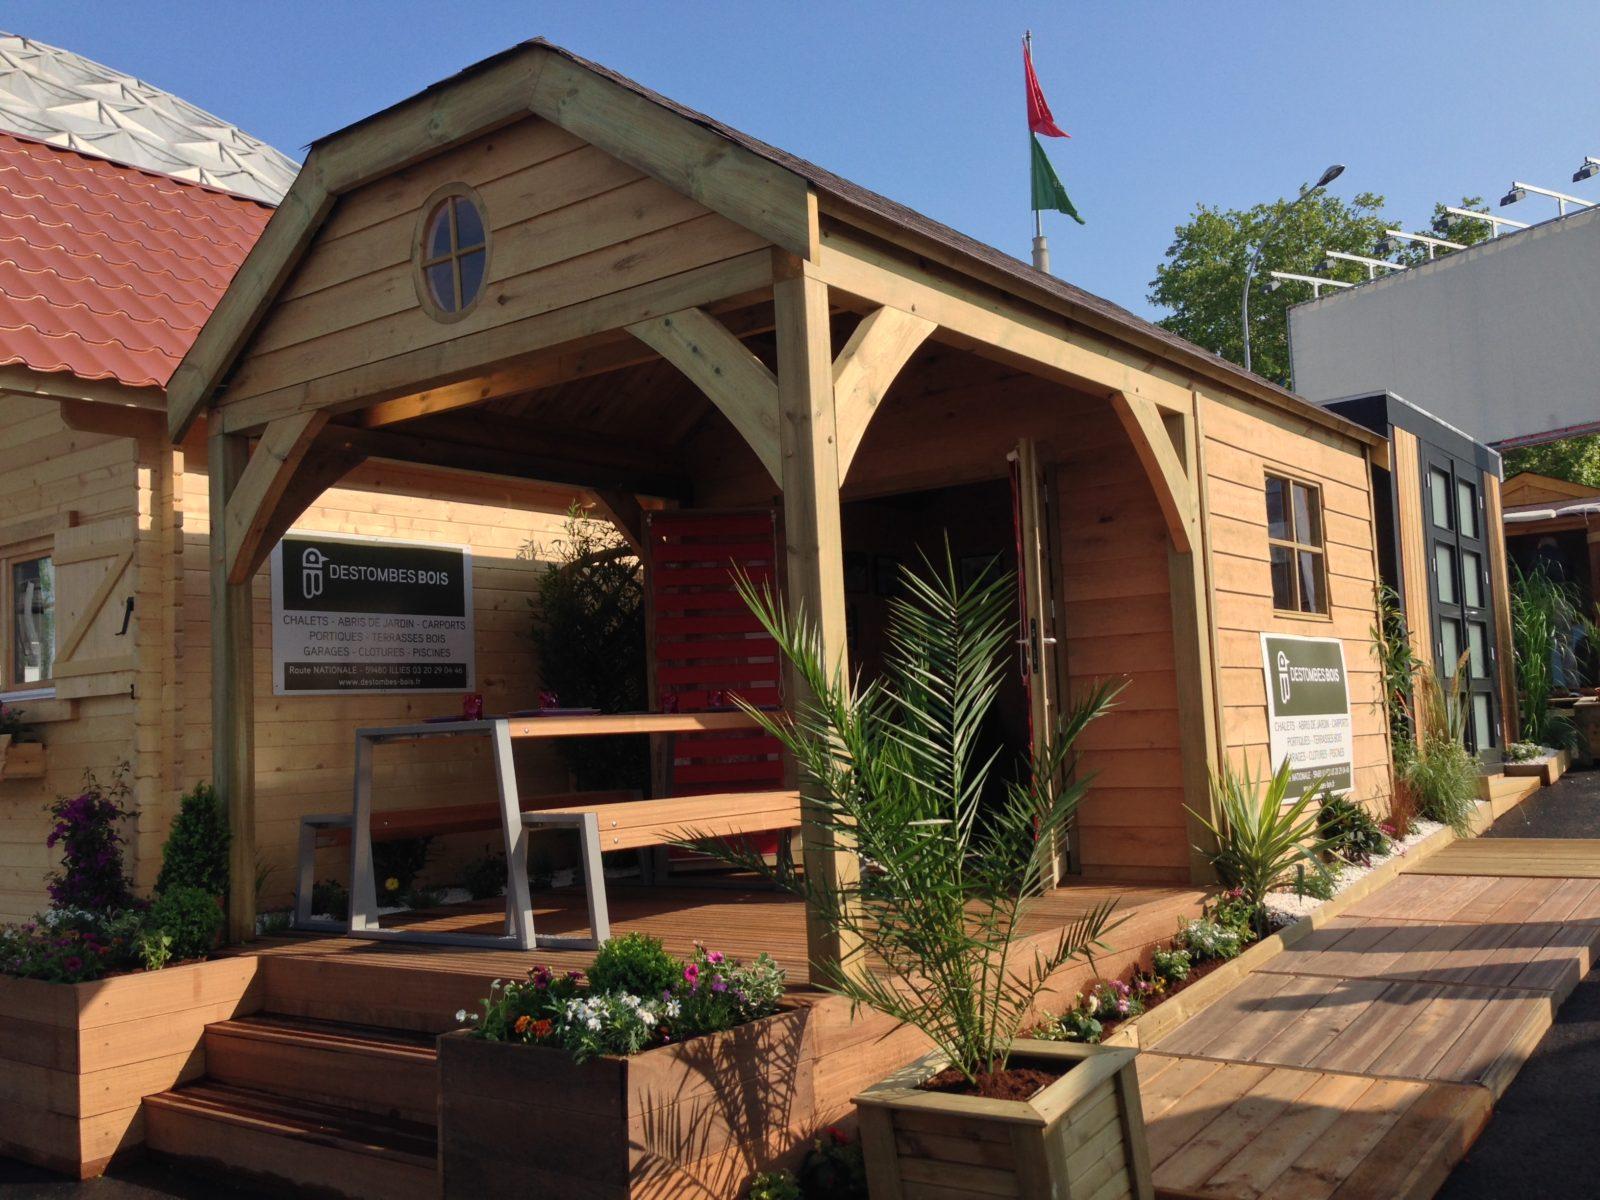 Destombes Bois | Abri De Jardin Bois - Garage - Carport ... encequiconcerne Fabricant Abri De Jardin Belgique